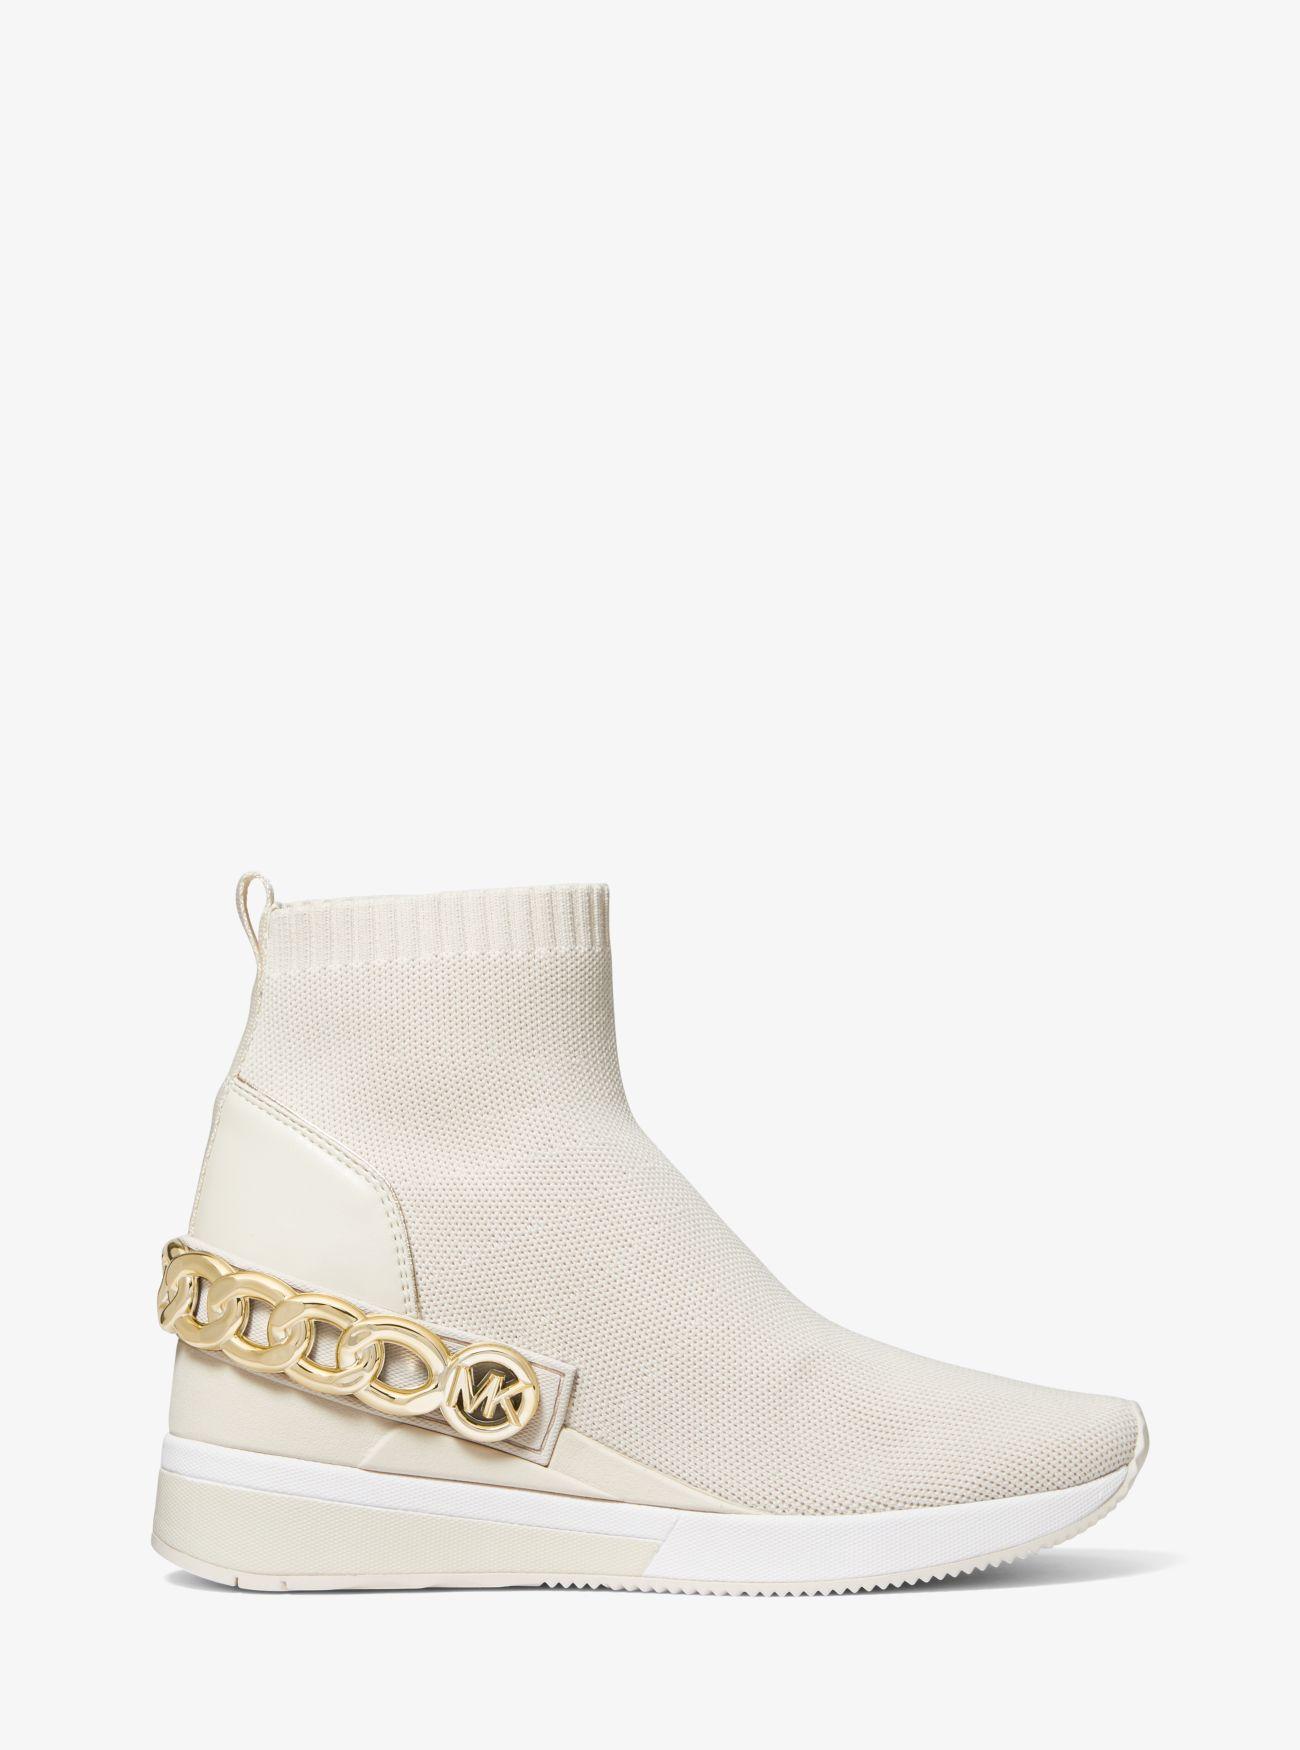 Zapatilla Skyler tipo calcetín de punto elástico con adornos de cadena